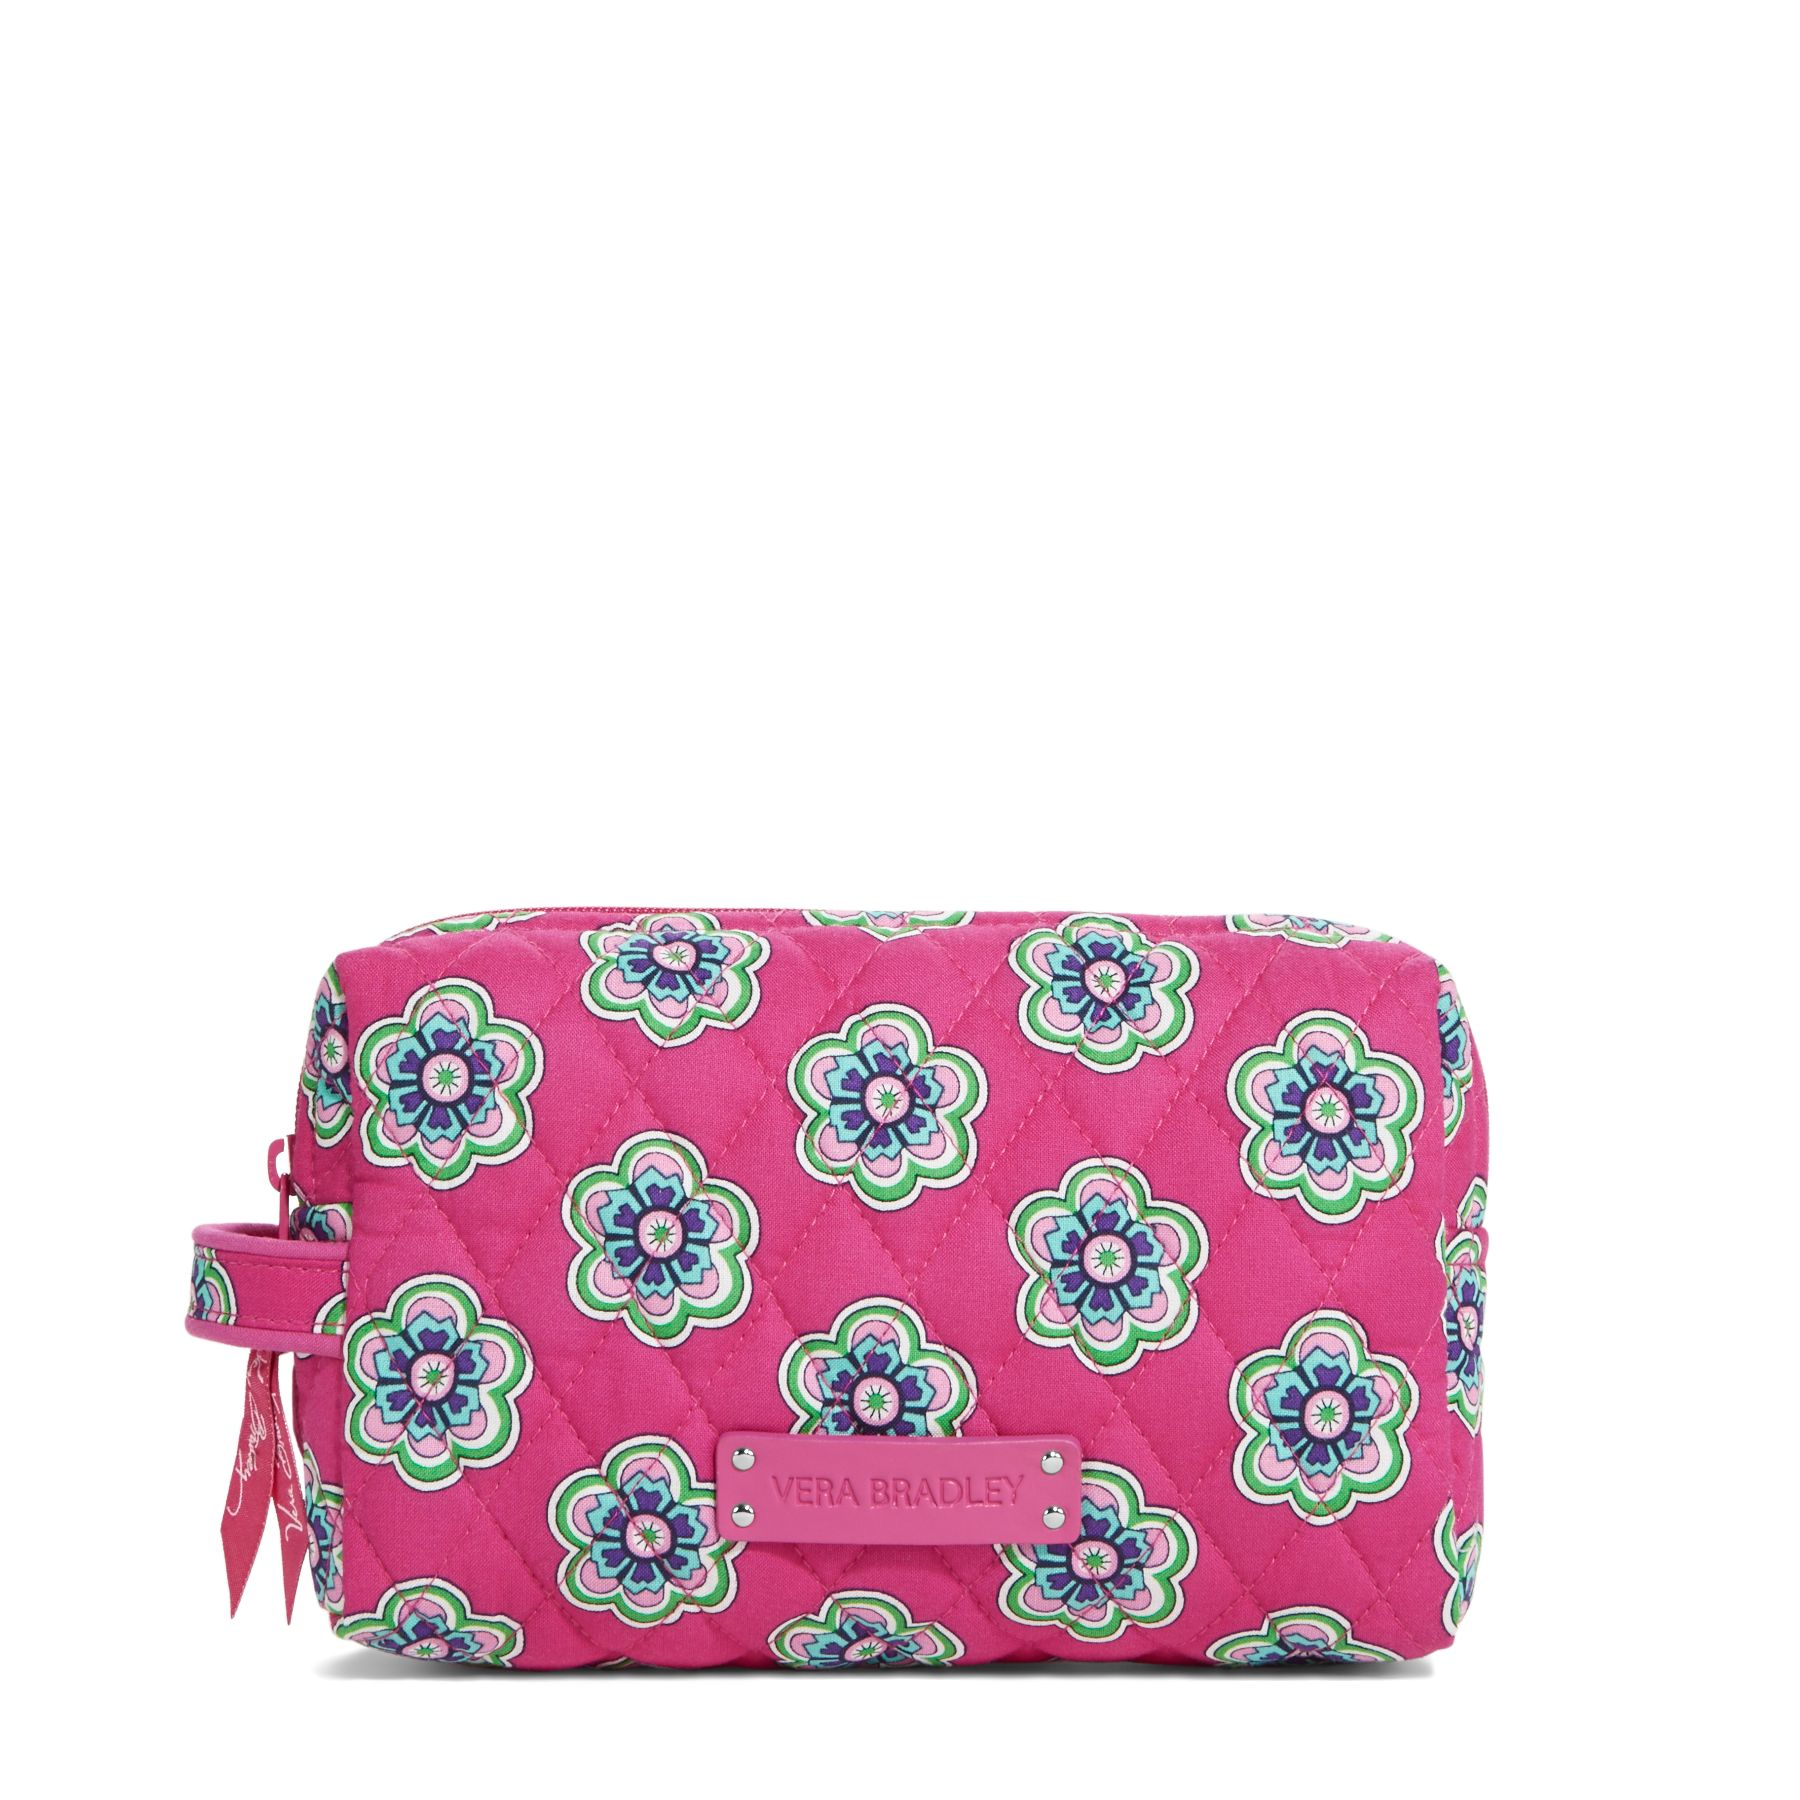 Vera Bradley Medium Cosmetic in Pink Swirls Flowers